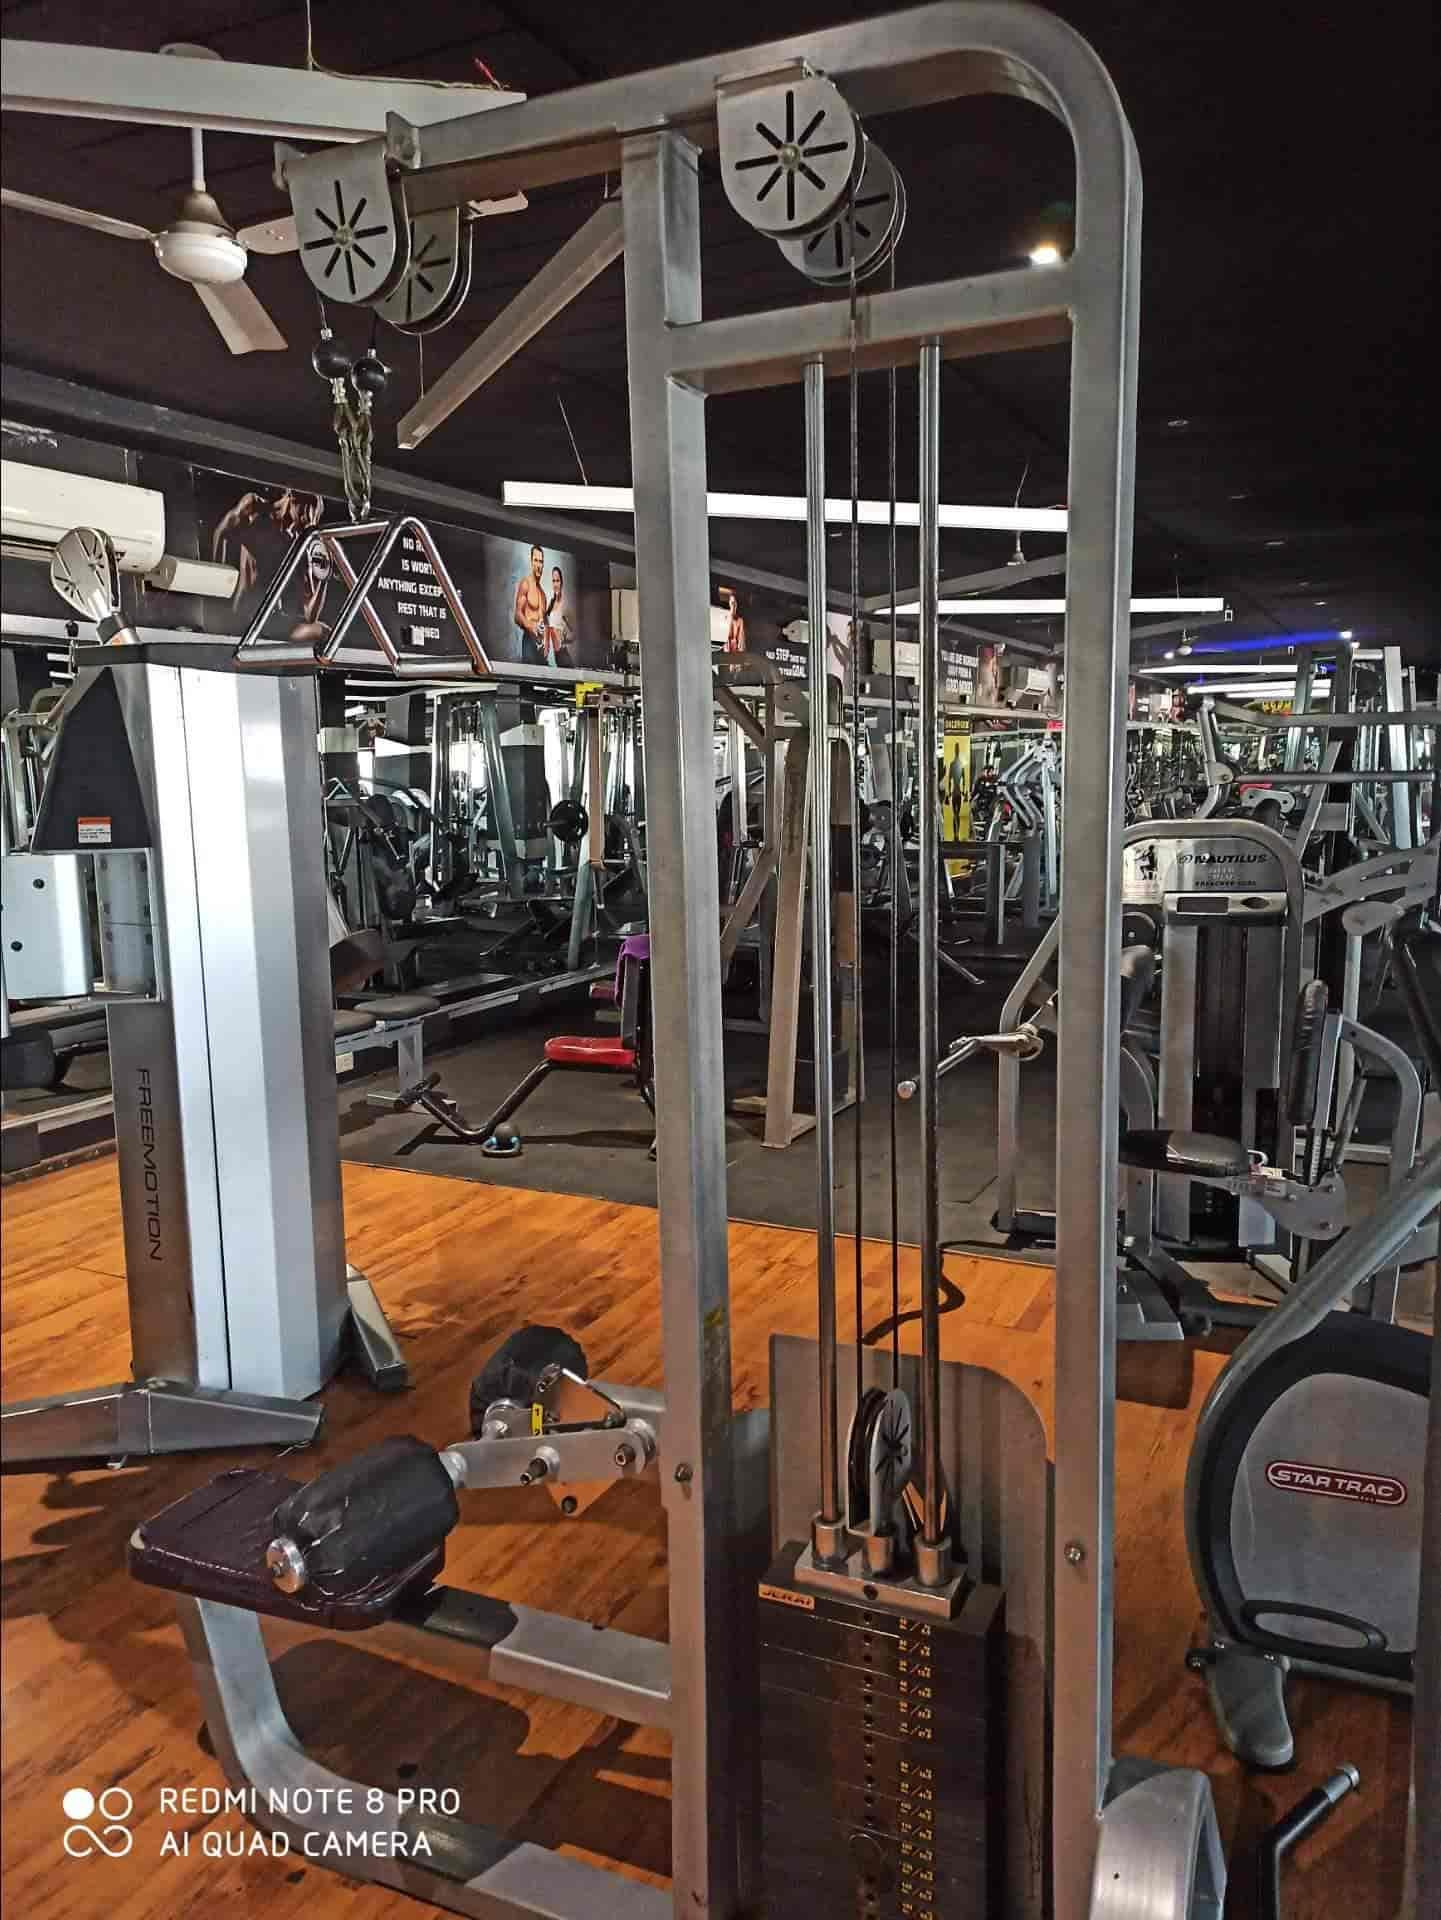 Girme Gym Equipments And Handicrafts, Canada Corner - Gymnasium Equipment  Dealers in Nashik - Justdial